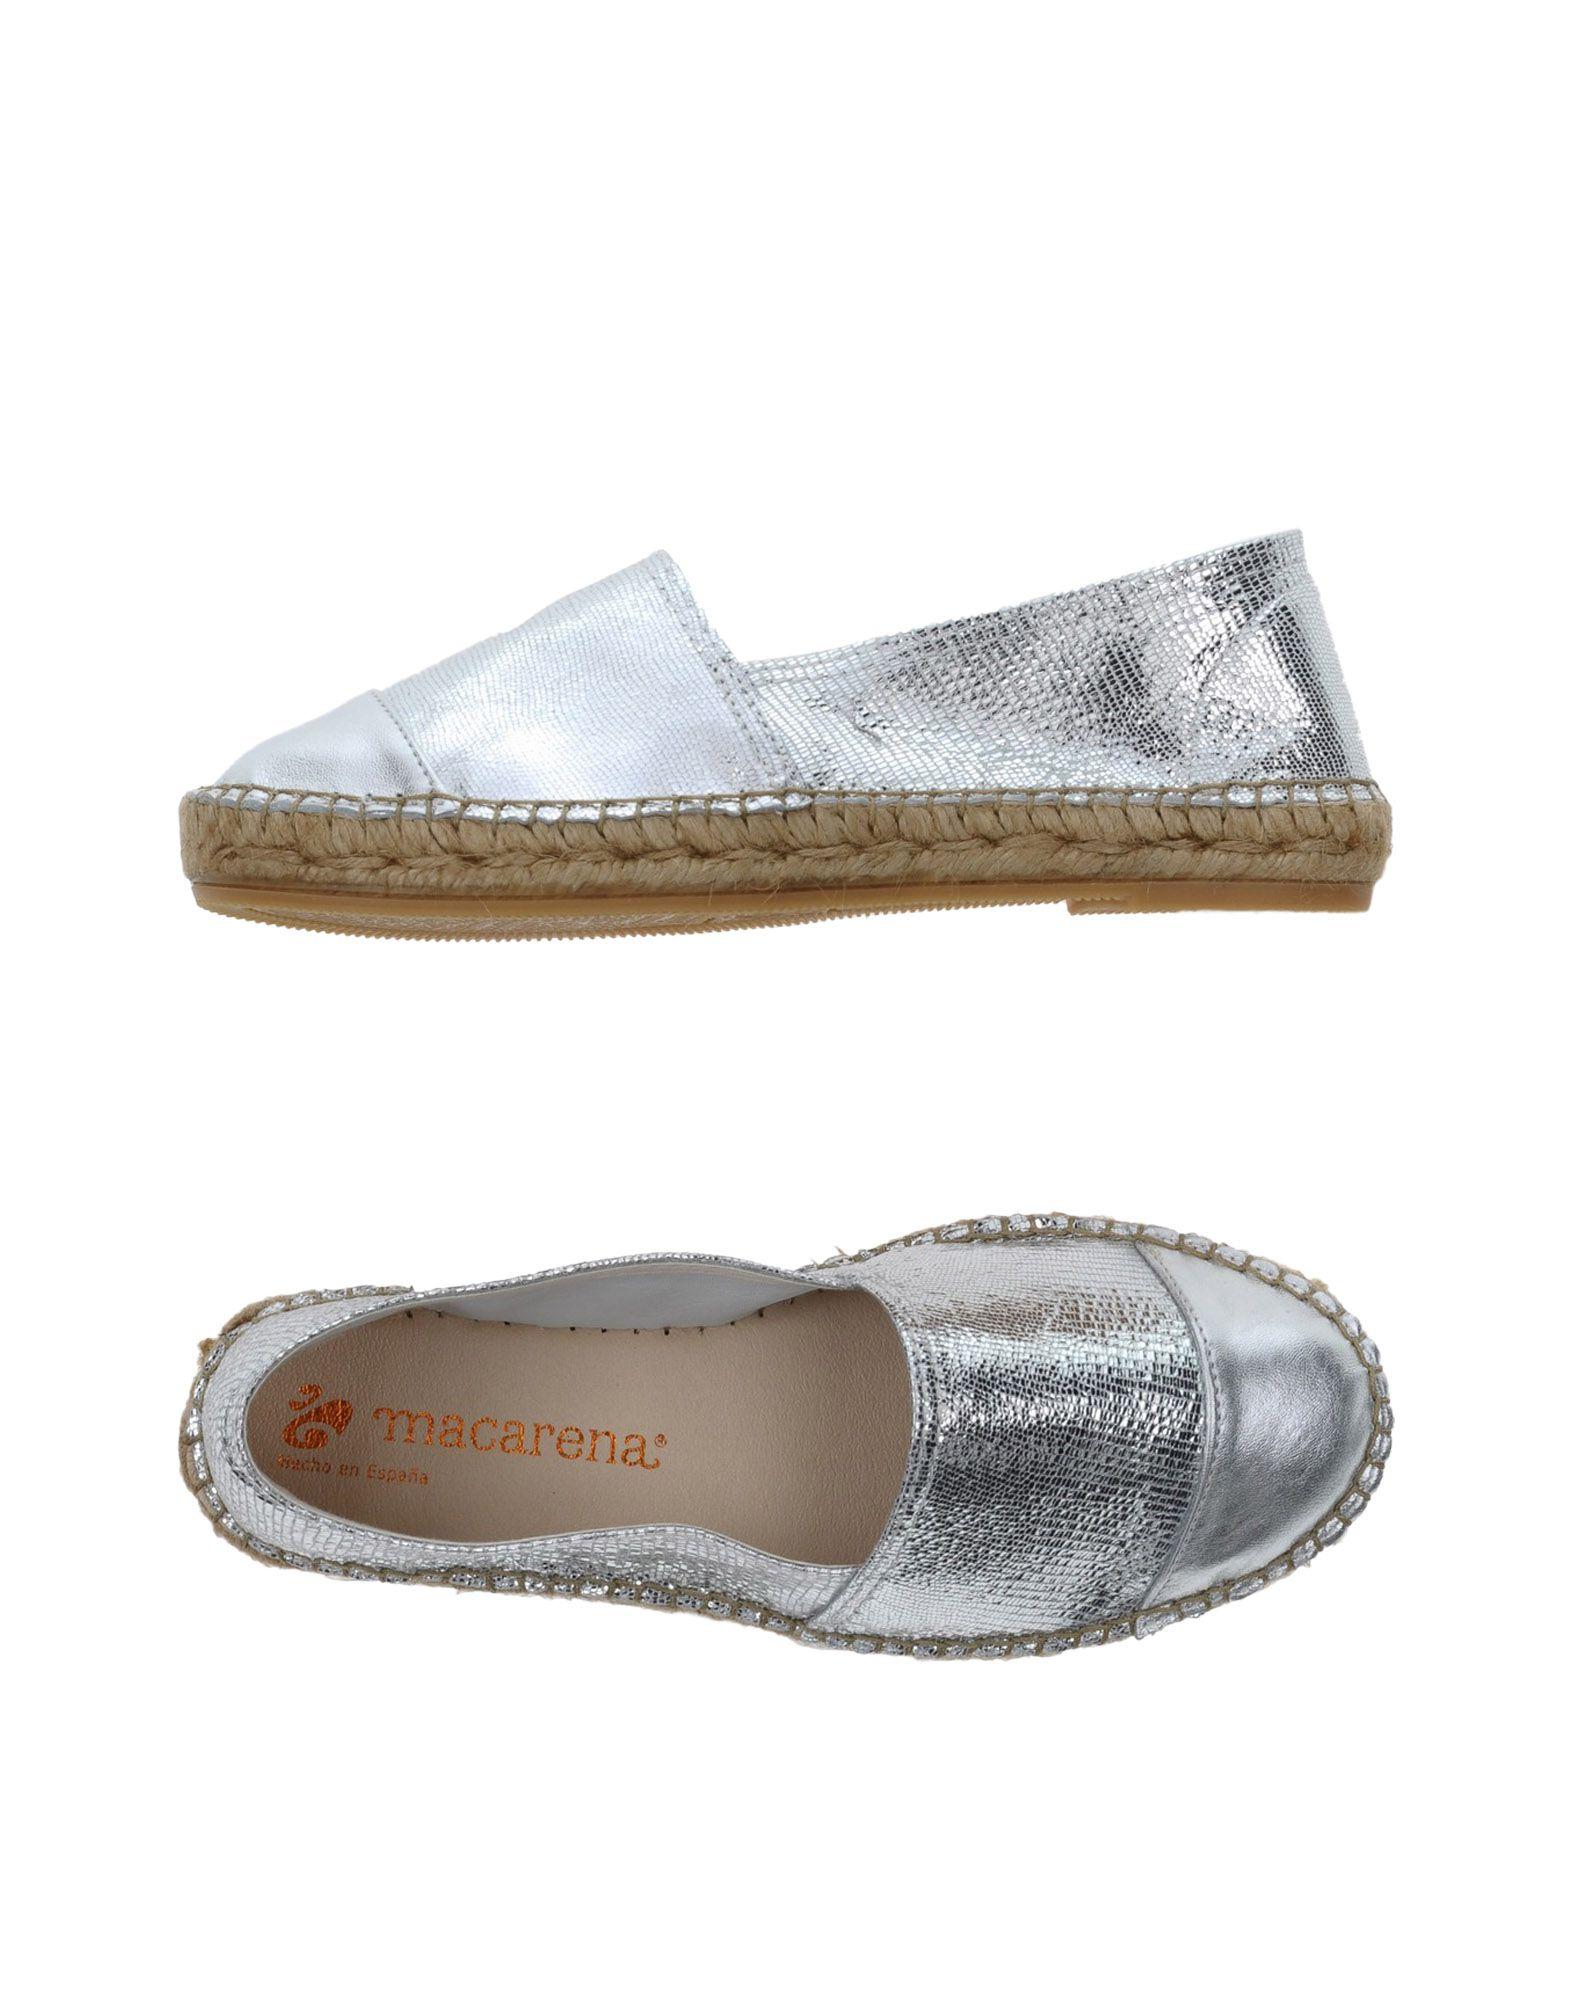 Macarena® Espadrilles Damen  11354791VW Gute Qualität beliebte Schuhe